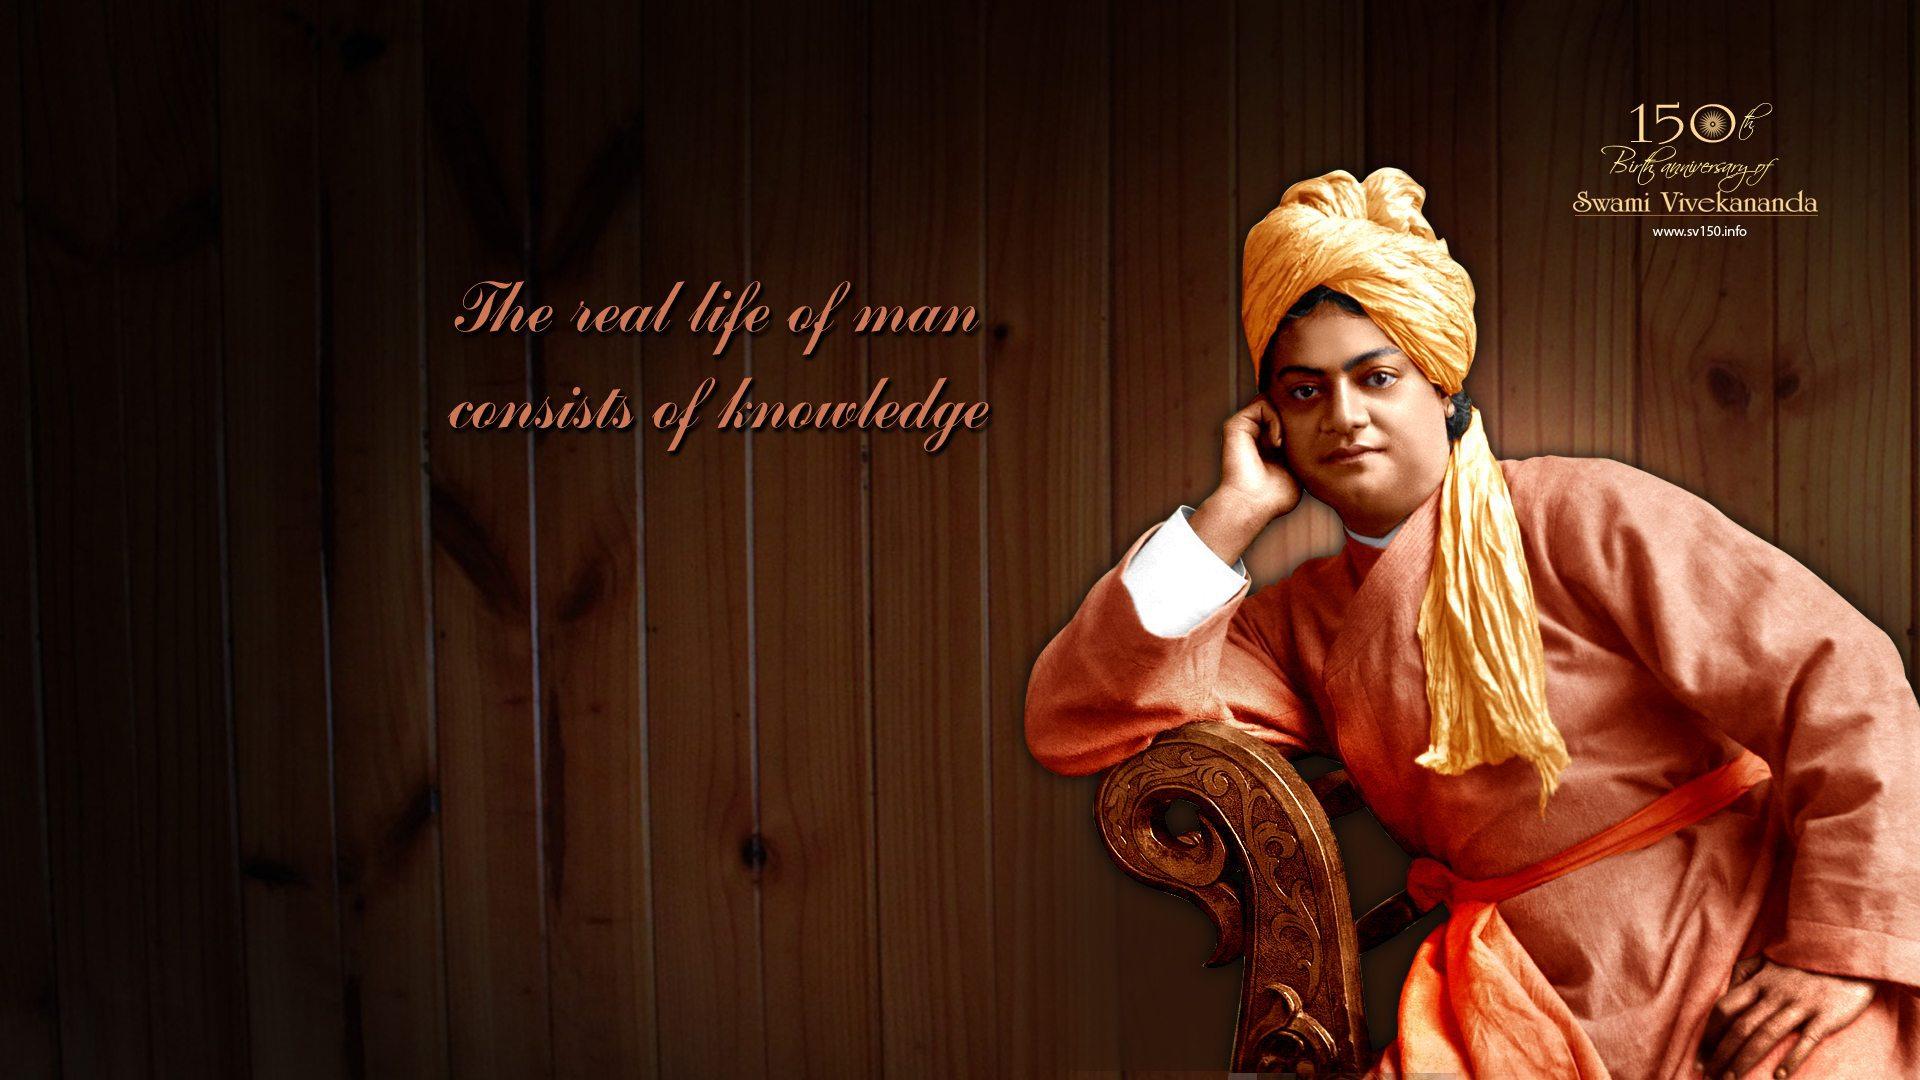 Swami Vivekananda Quotes HQ Wallpaper 12414   Baltana 1920x1080